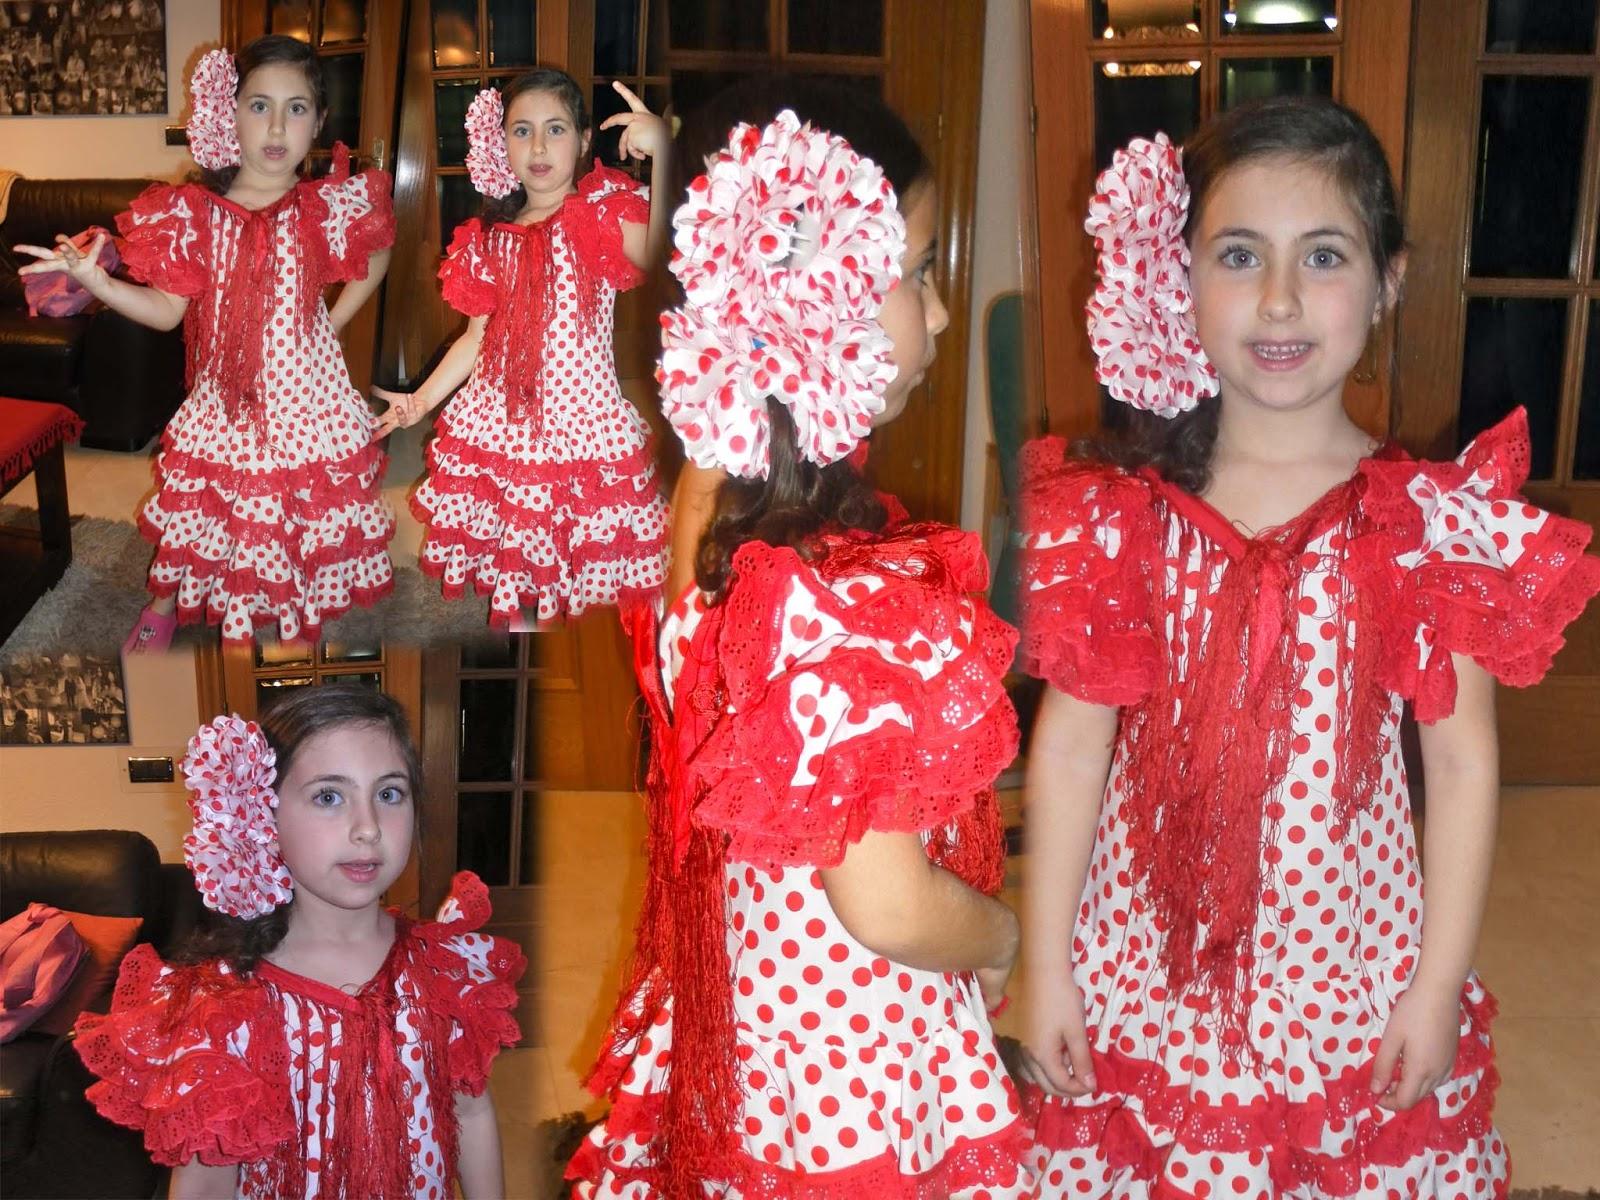 Solo yo: Disfraz de Sevillana para Carnaval 2013. Vestido de Flamenca.